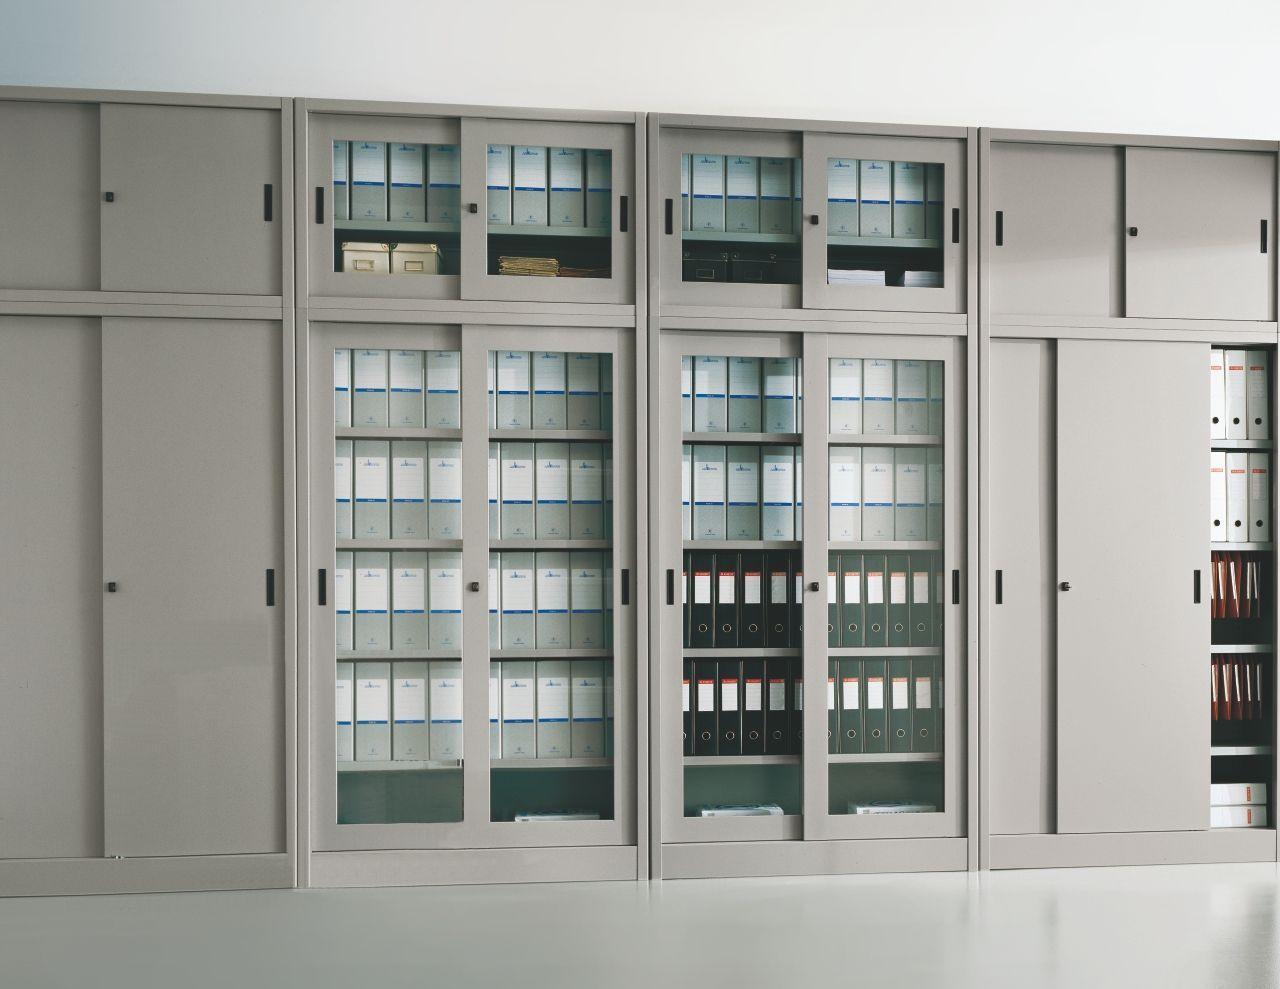 Armadio Metallico Ufficio : Armadi metallici ante scorrevoli imetallici arredamento